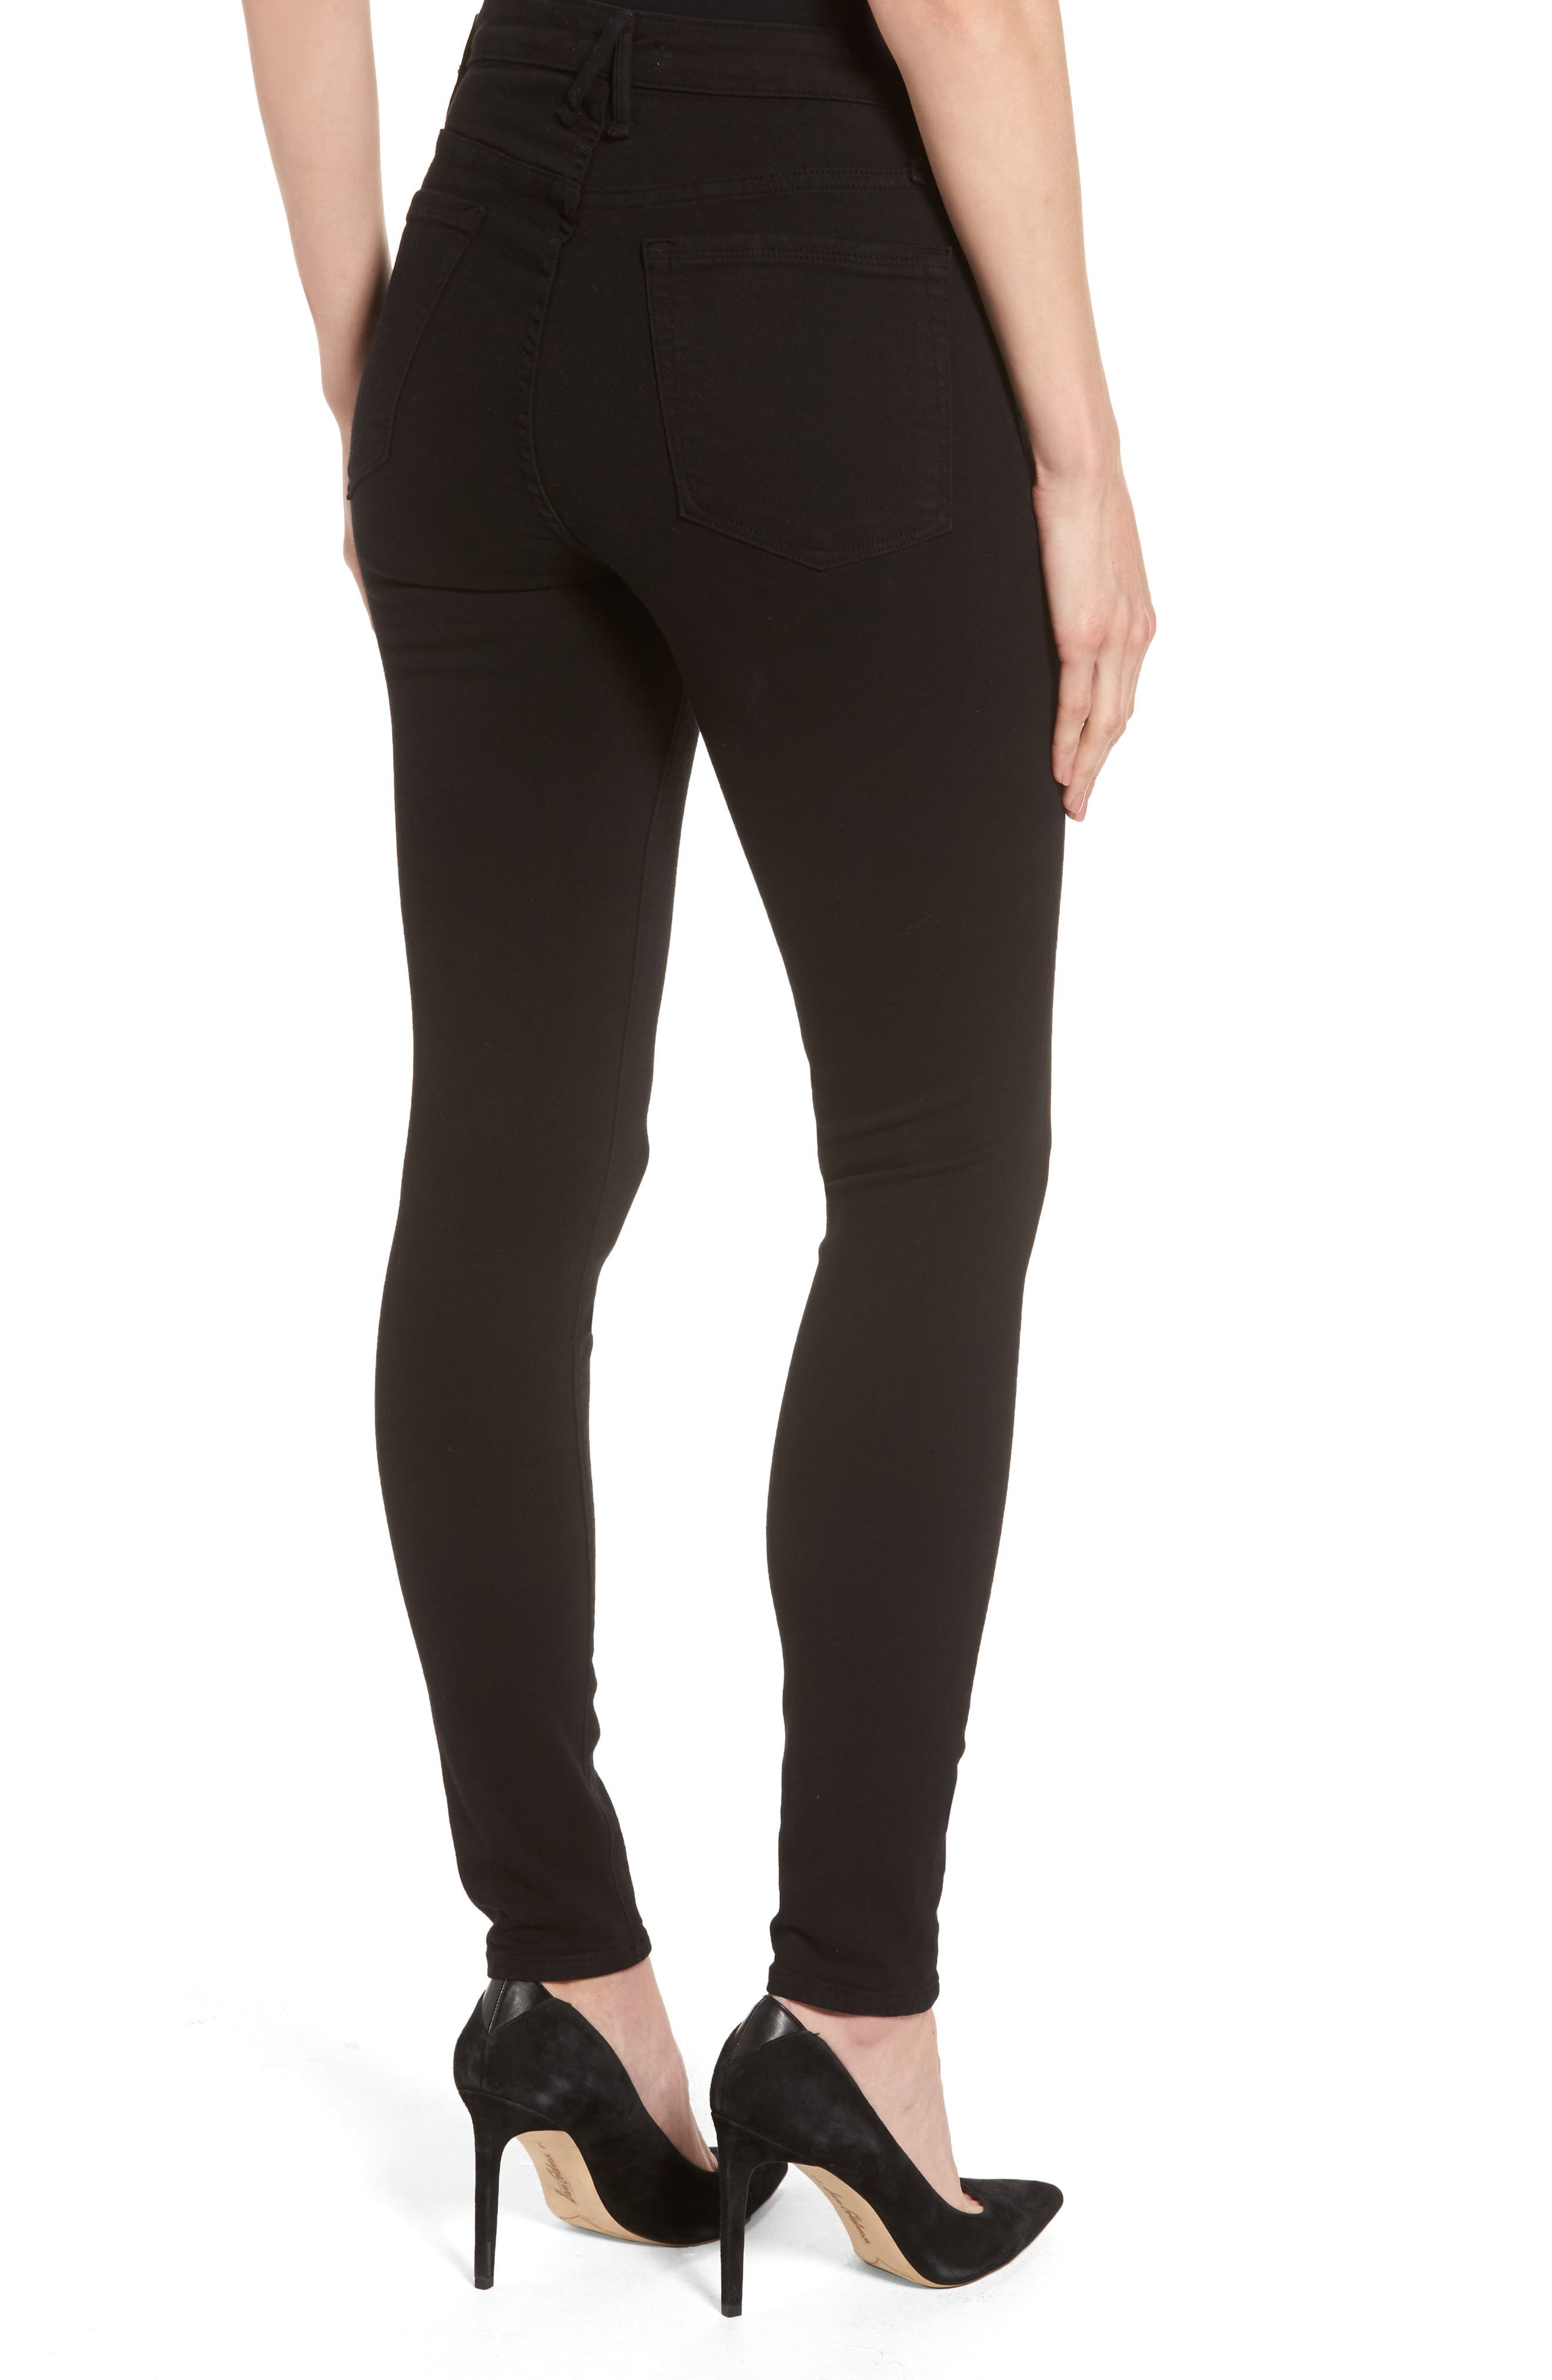 Alternate Image 2  - Good American High Waist Side Zip Skinny Jeans (Black 001) (Extended Sizes)